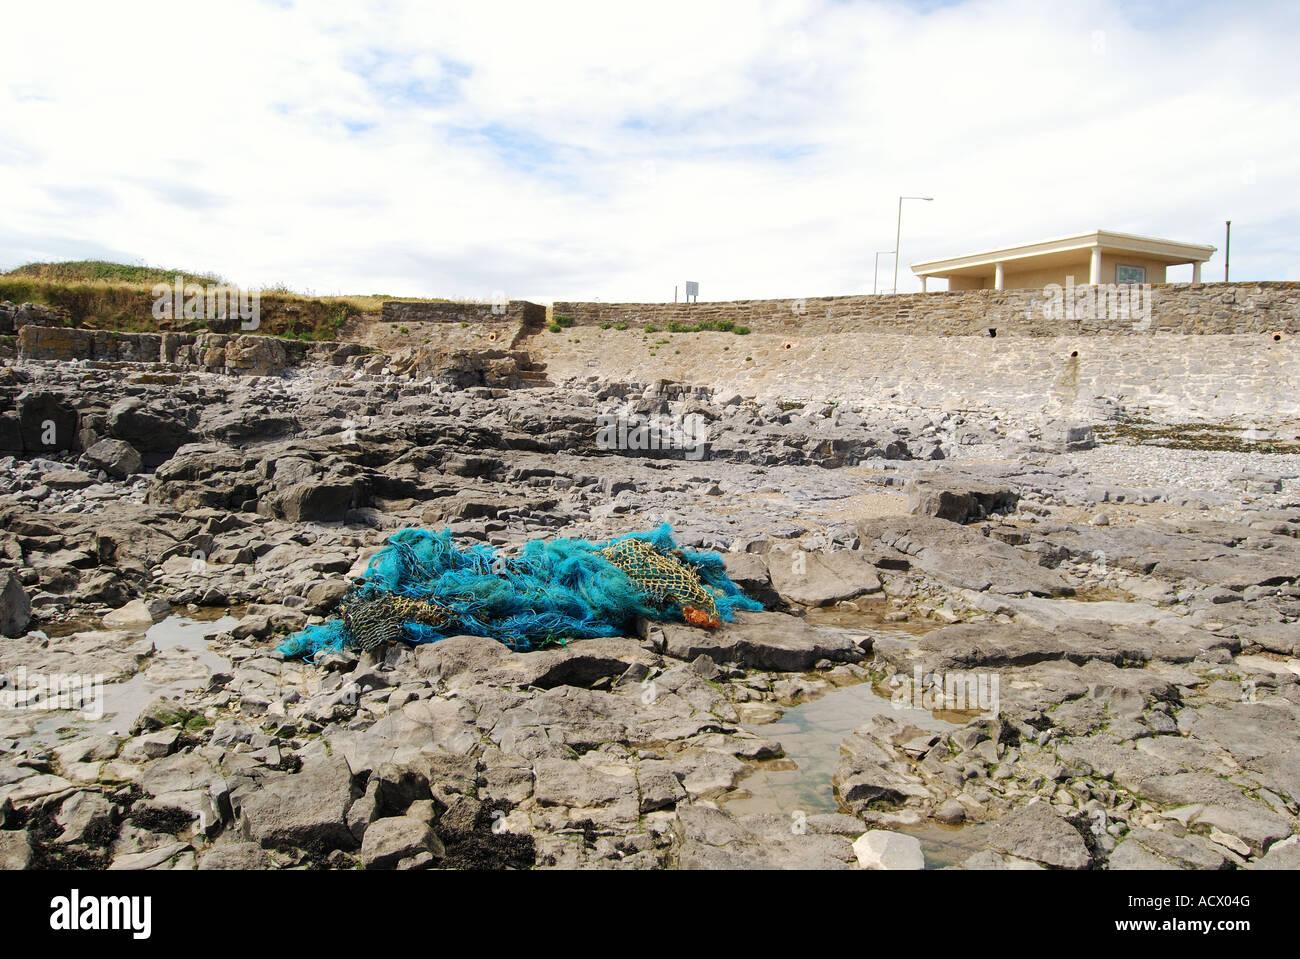 beached plastic fishing net no 2524 - Stock Image